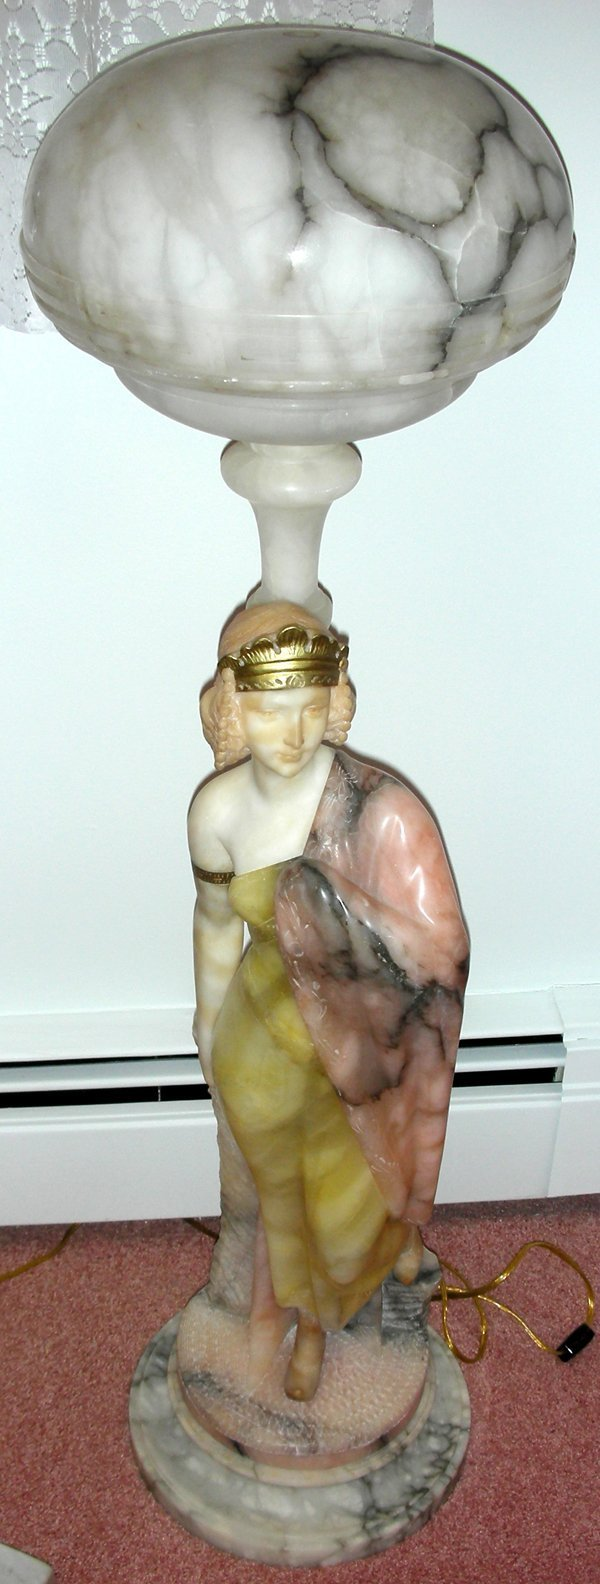 121003: ITALIAN CARVED ALABASTER FEMALE FIGURAL LAMP